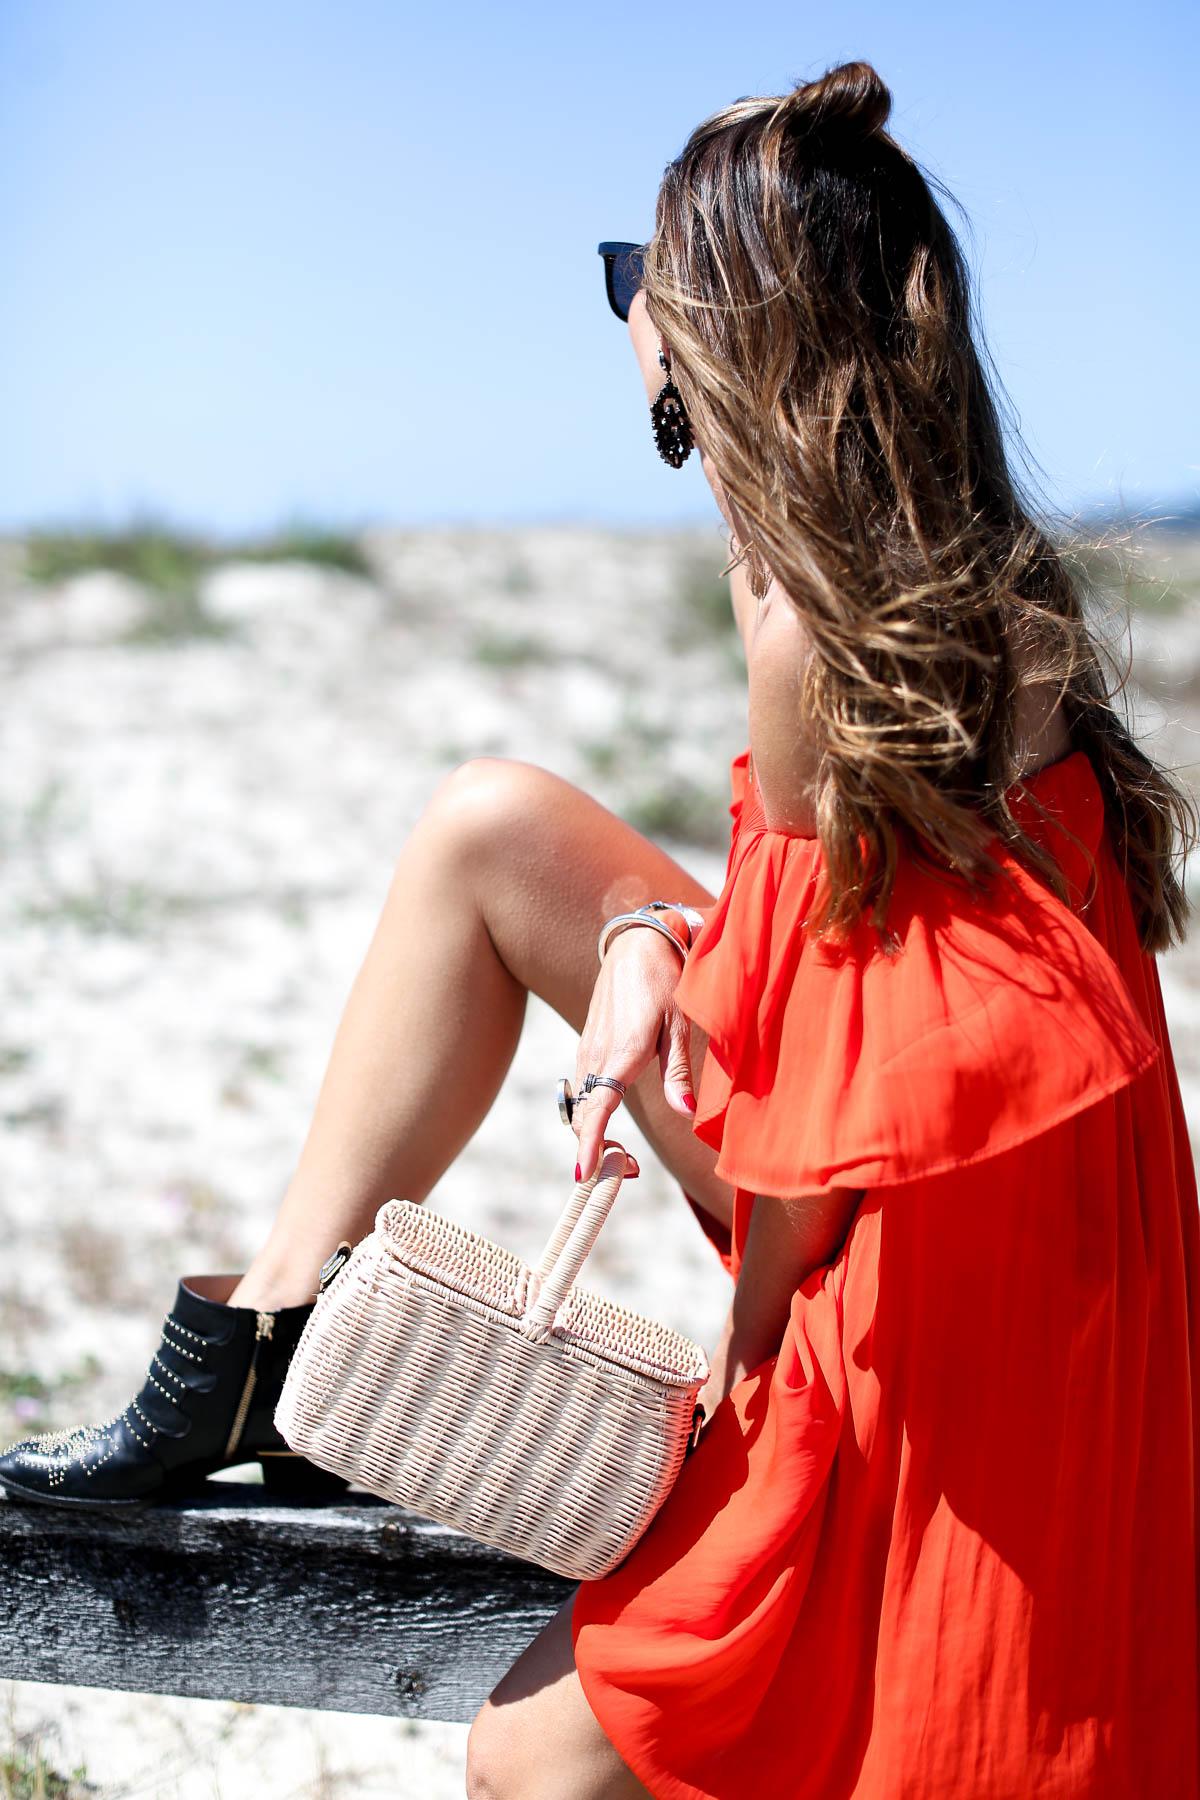 mybestfriends-chloe-estilo-moda-fashion-look-outfit-bartabac-streetstyle-blogger-blog-bartabacmode-5